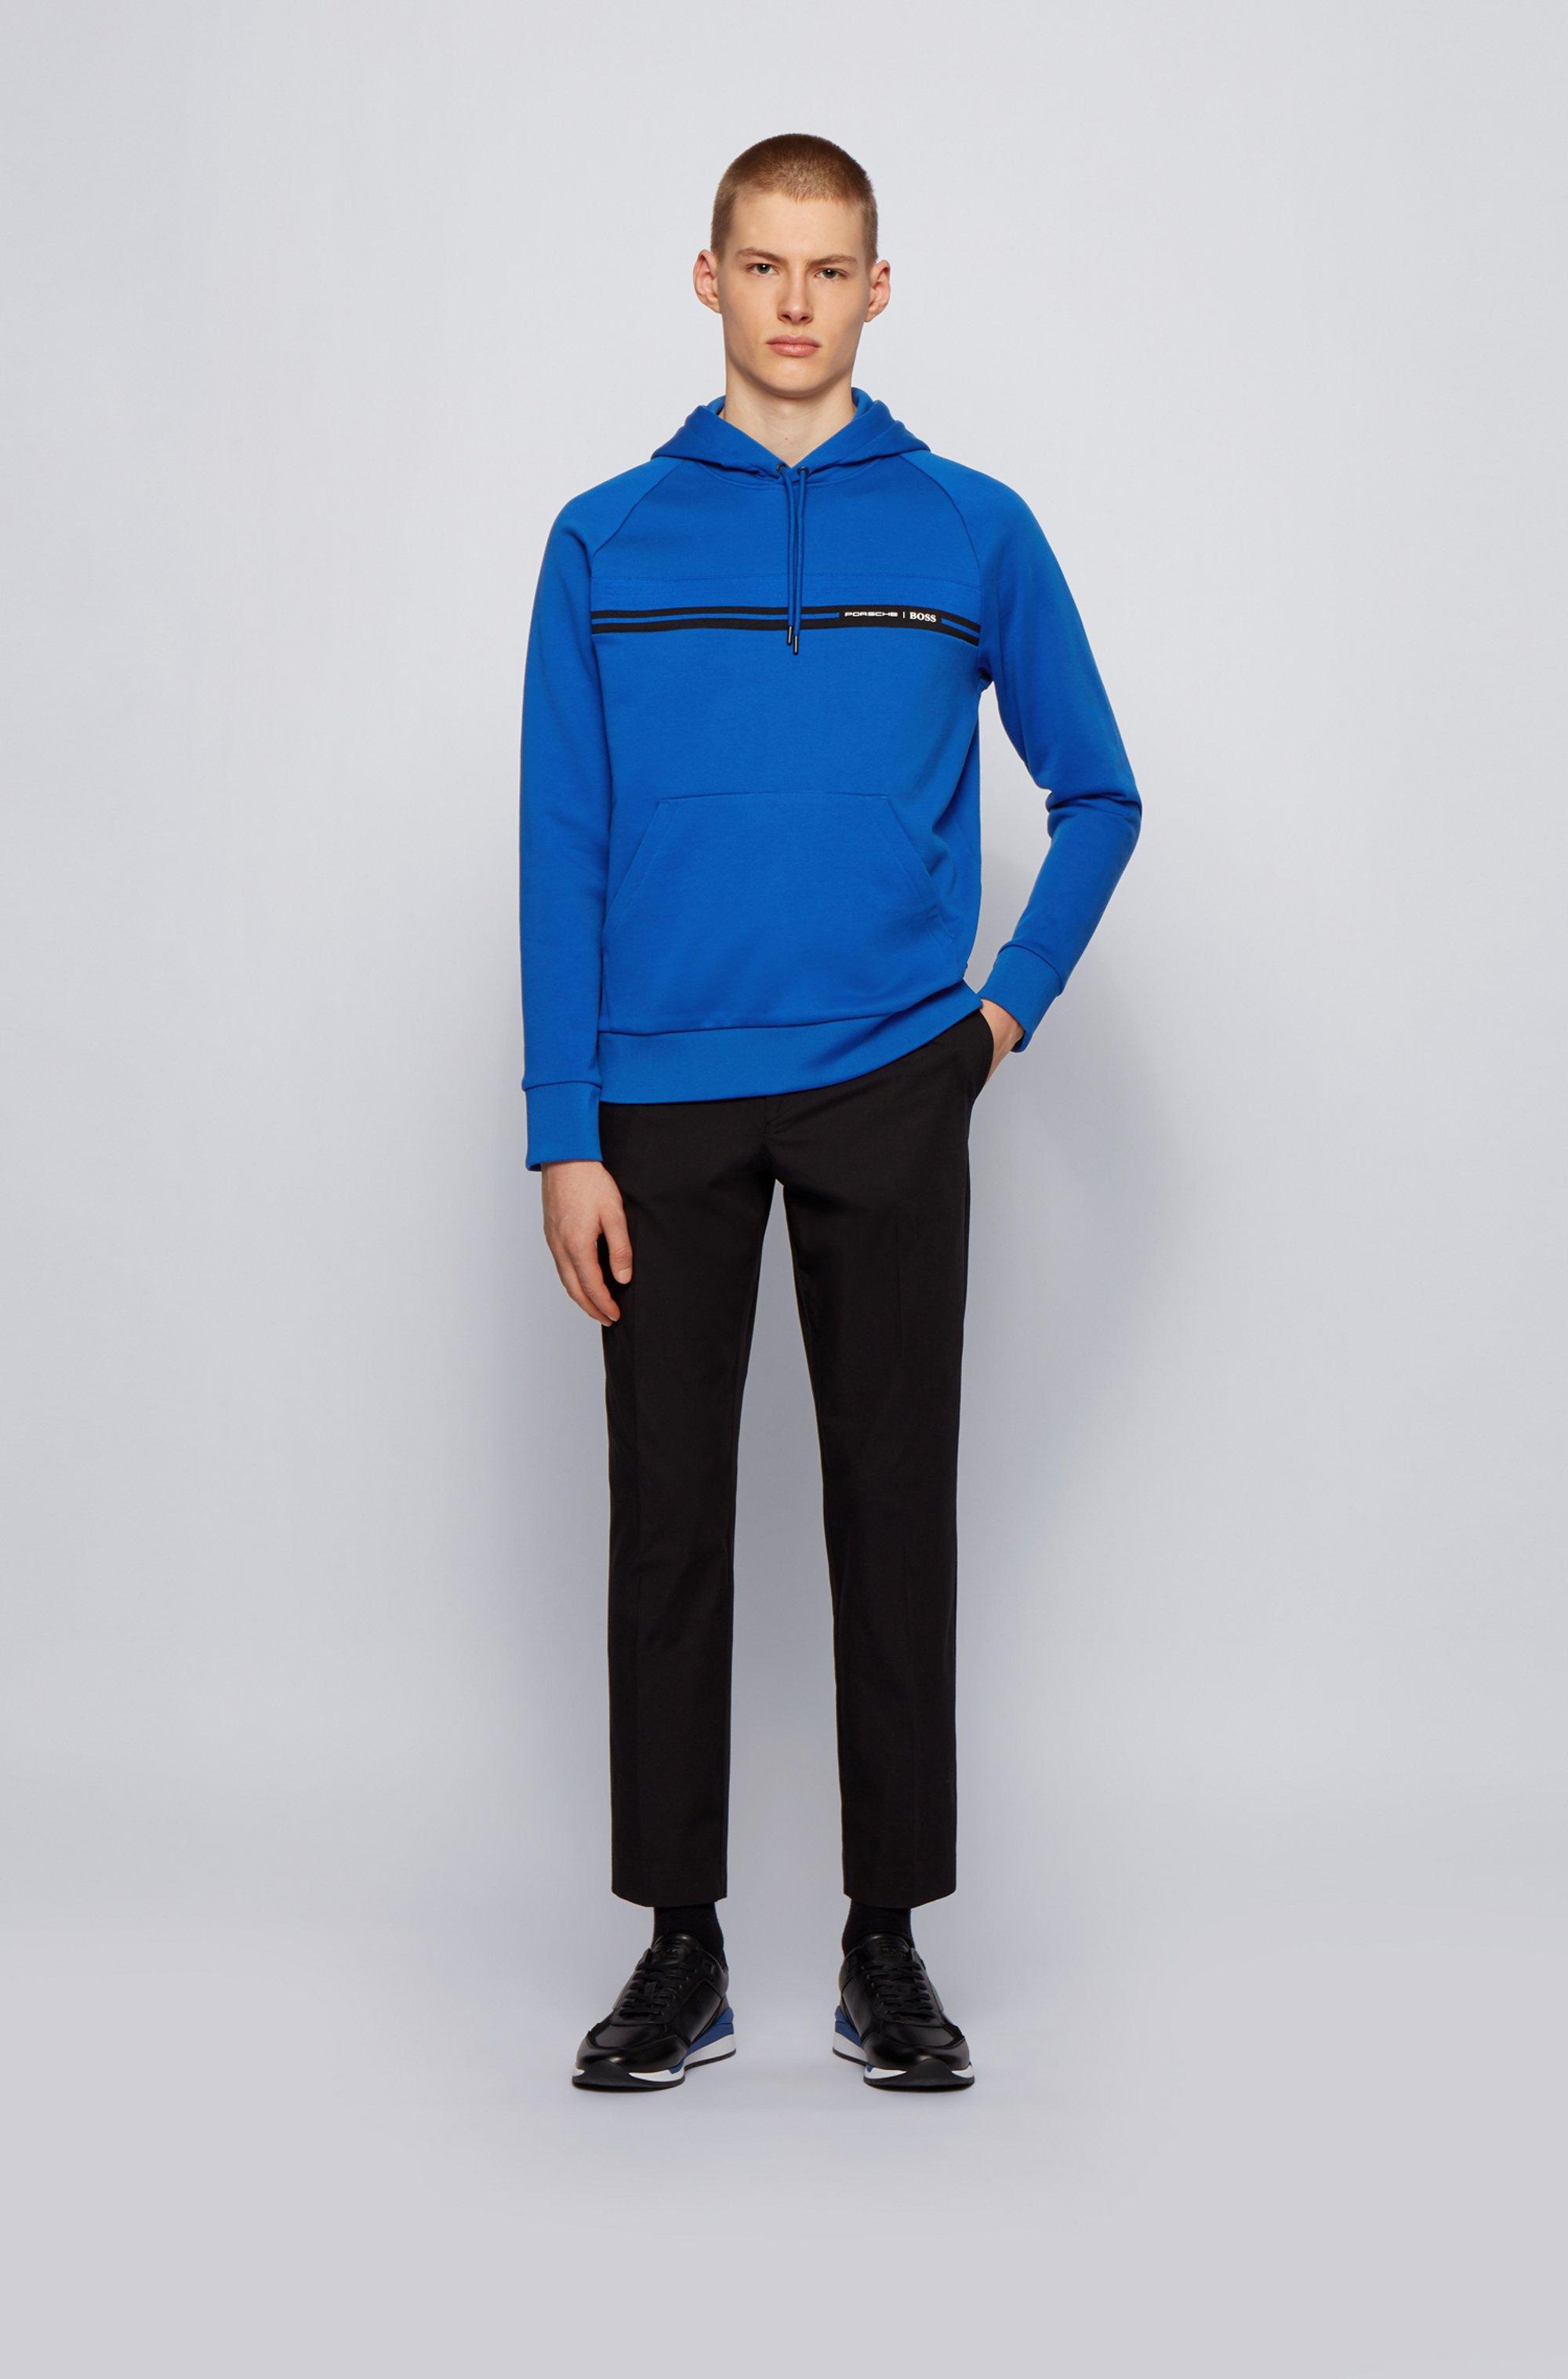 Regular-fit sweatshirt in mercerized cotton terry